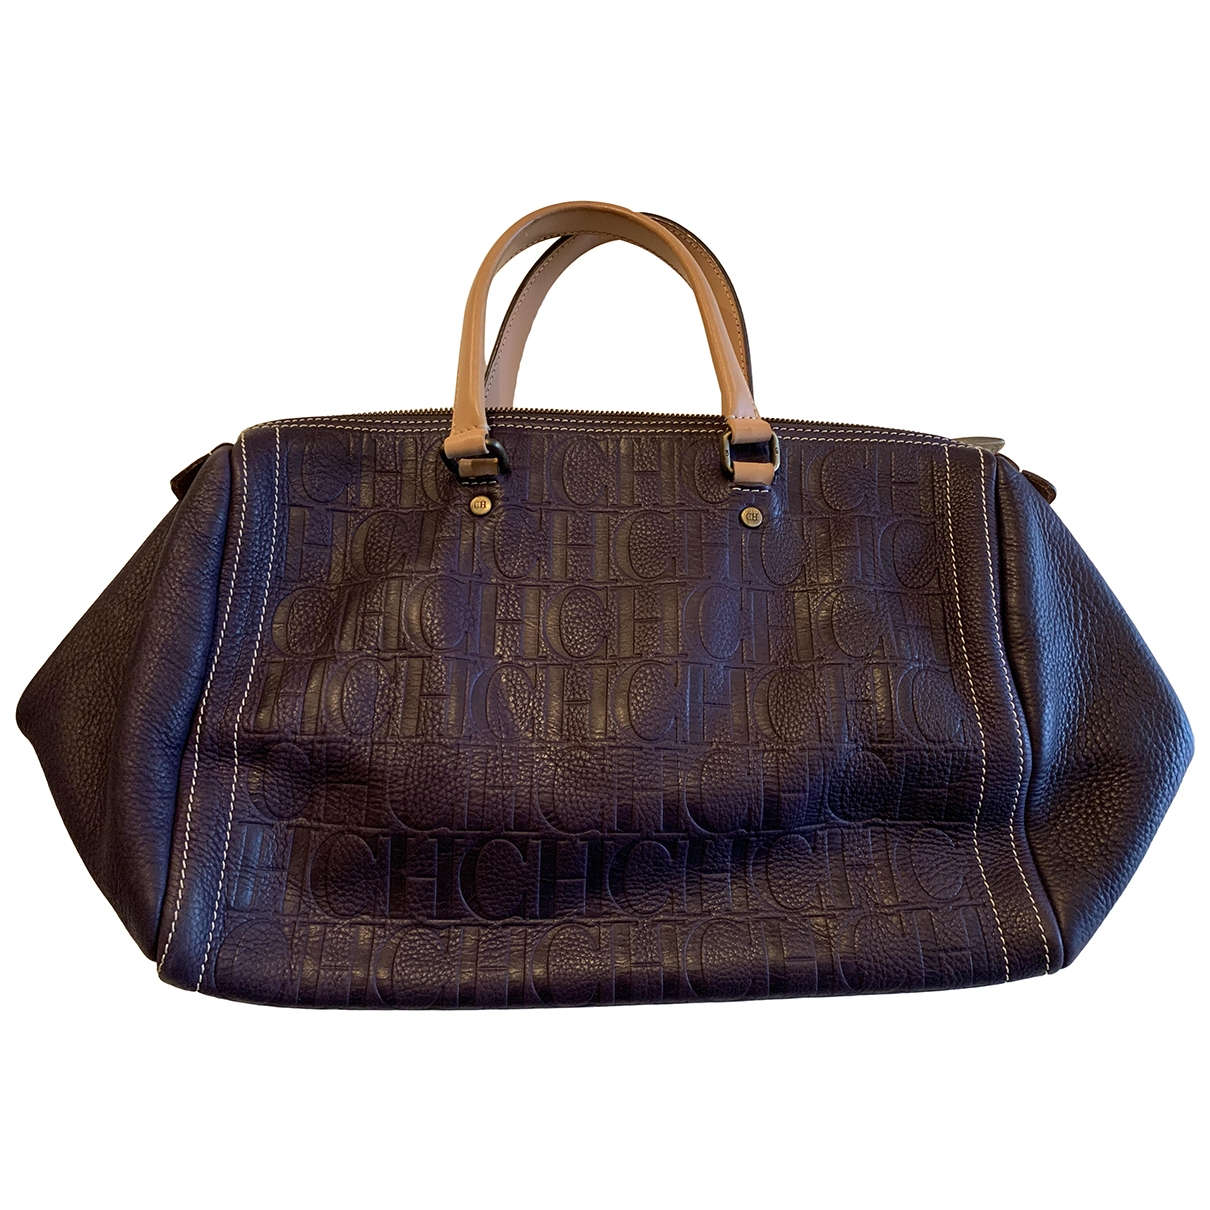 Carolina Herrera \N Purple Leather handbag for Women \N